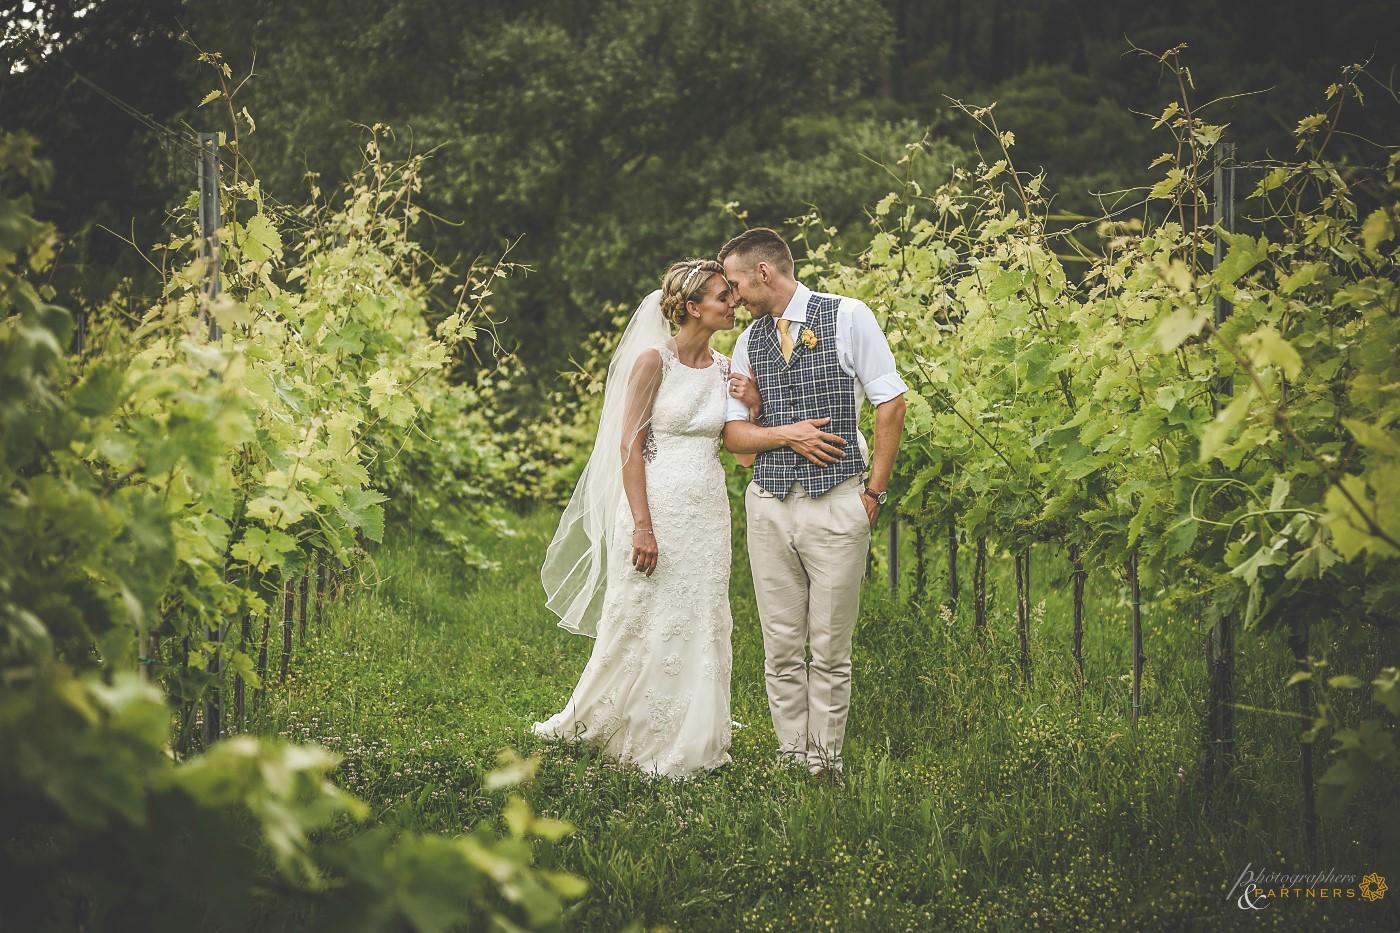 🍃 Romantic moment among the vineyards 🍃